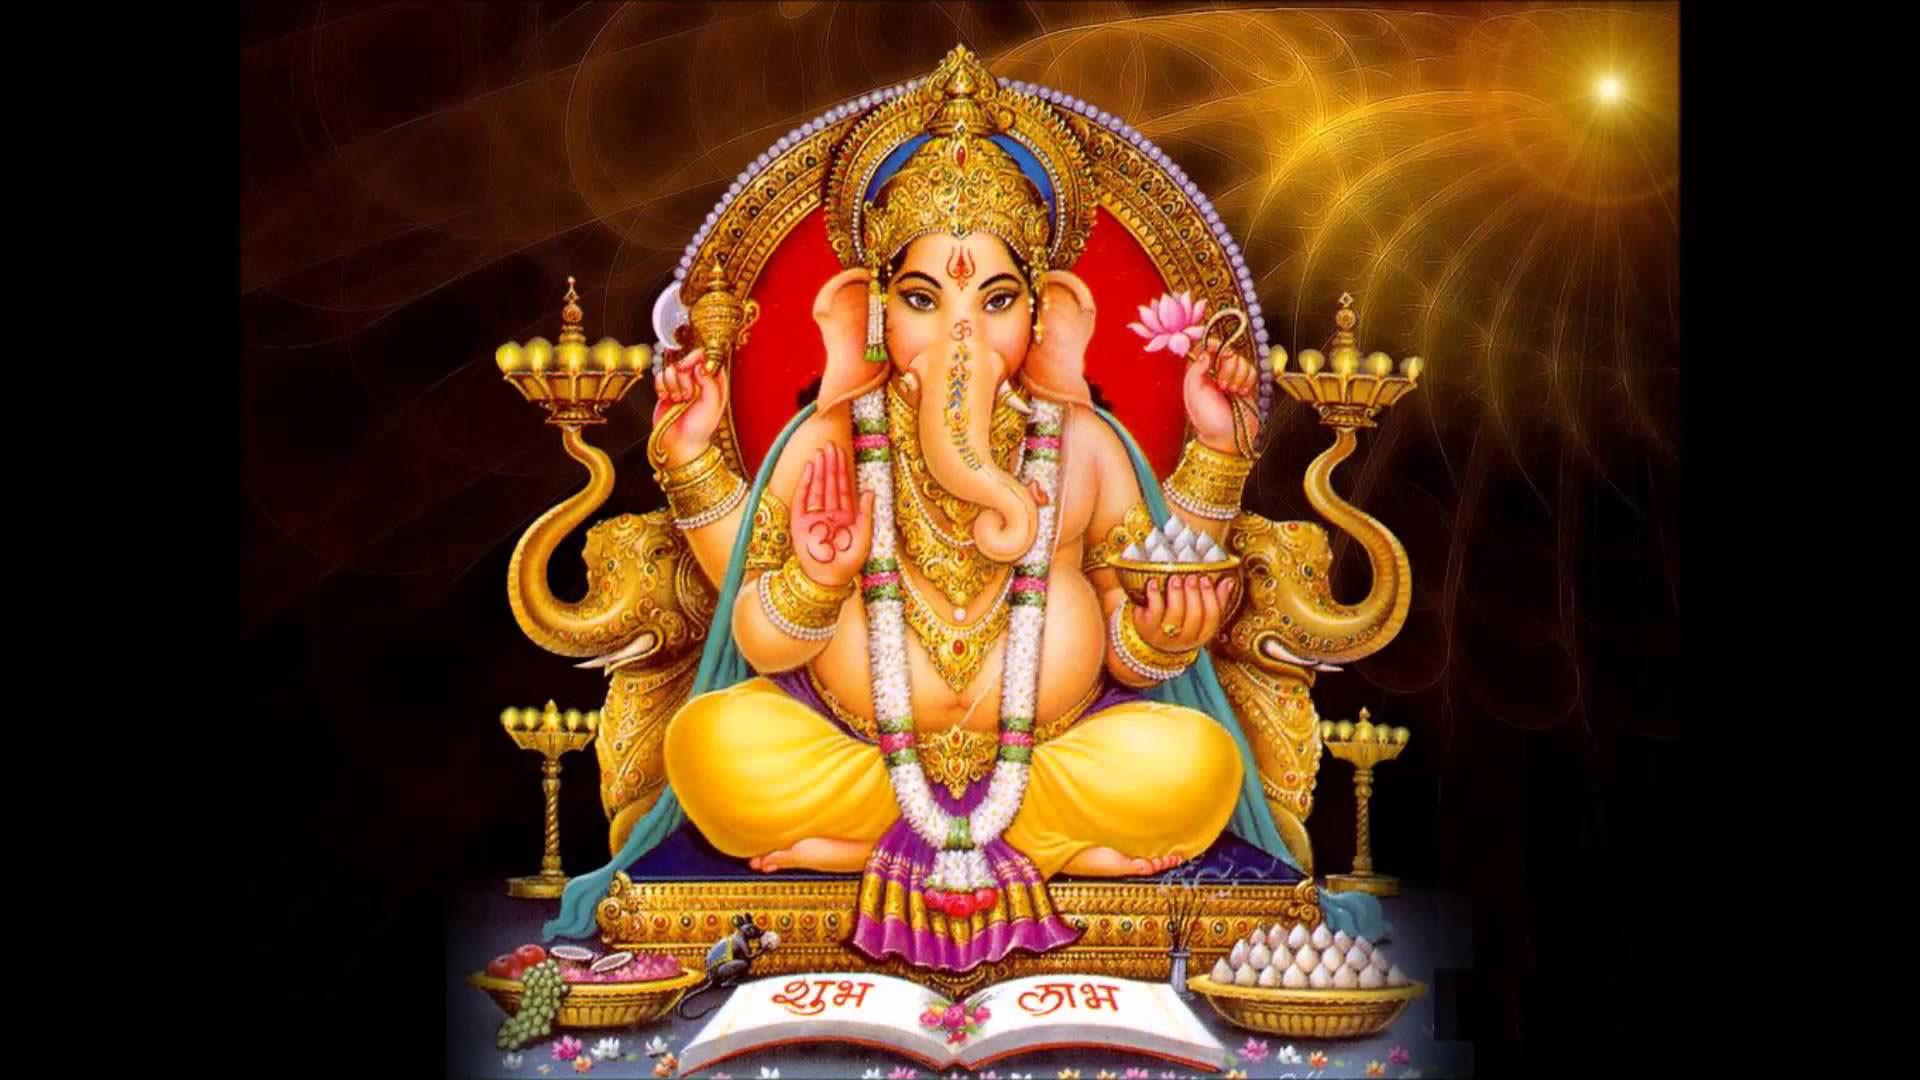 Ganesh Background 50 Images